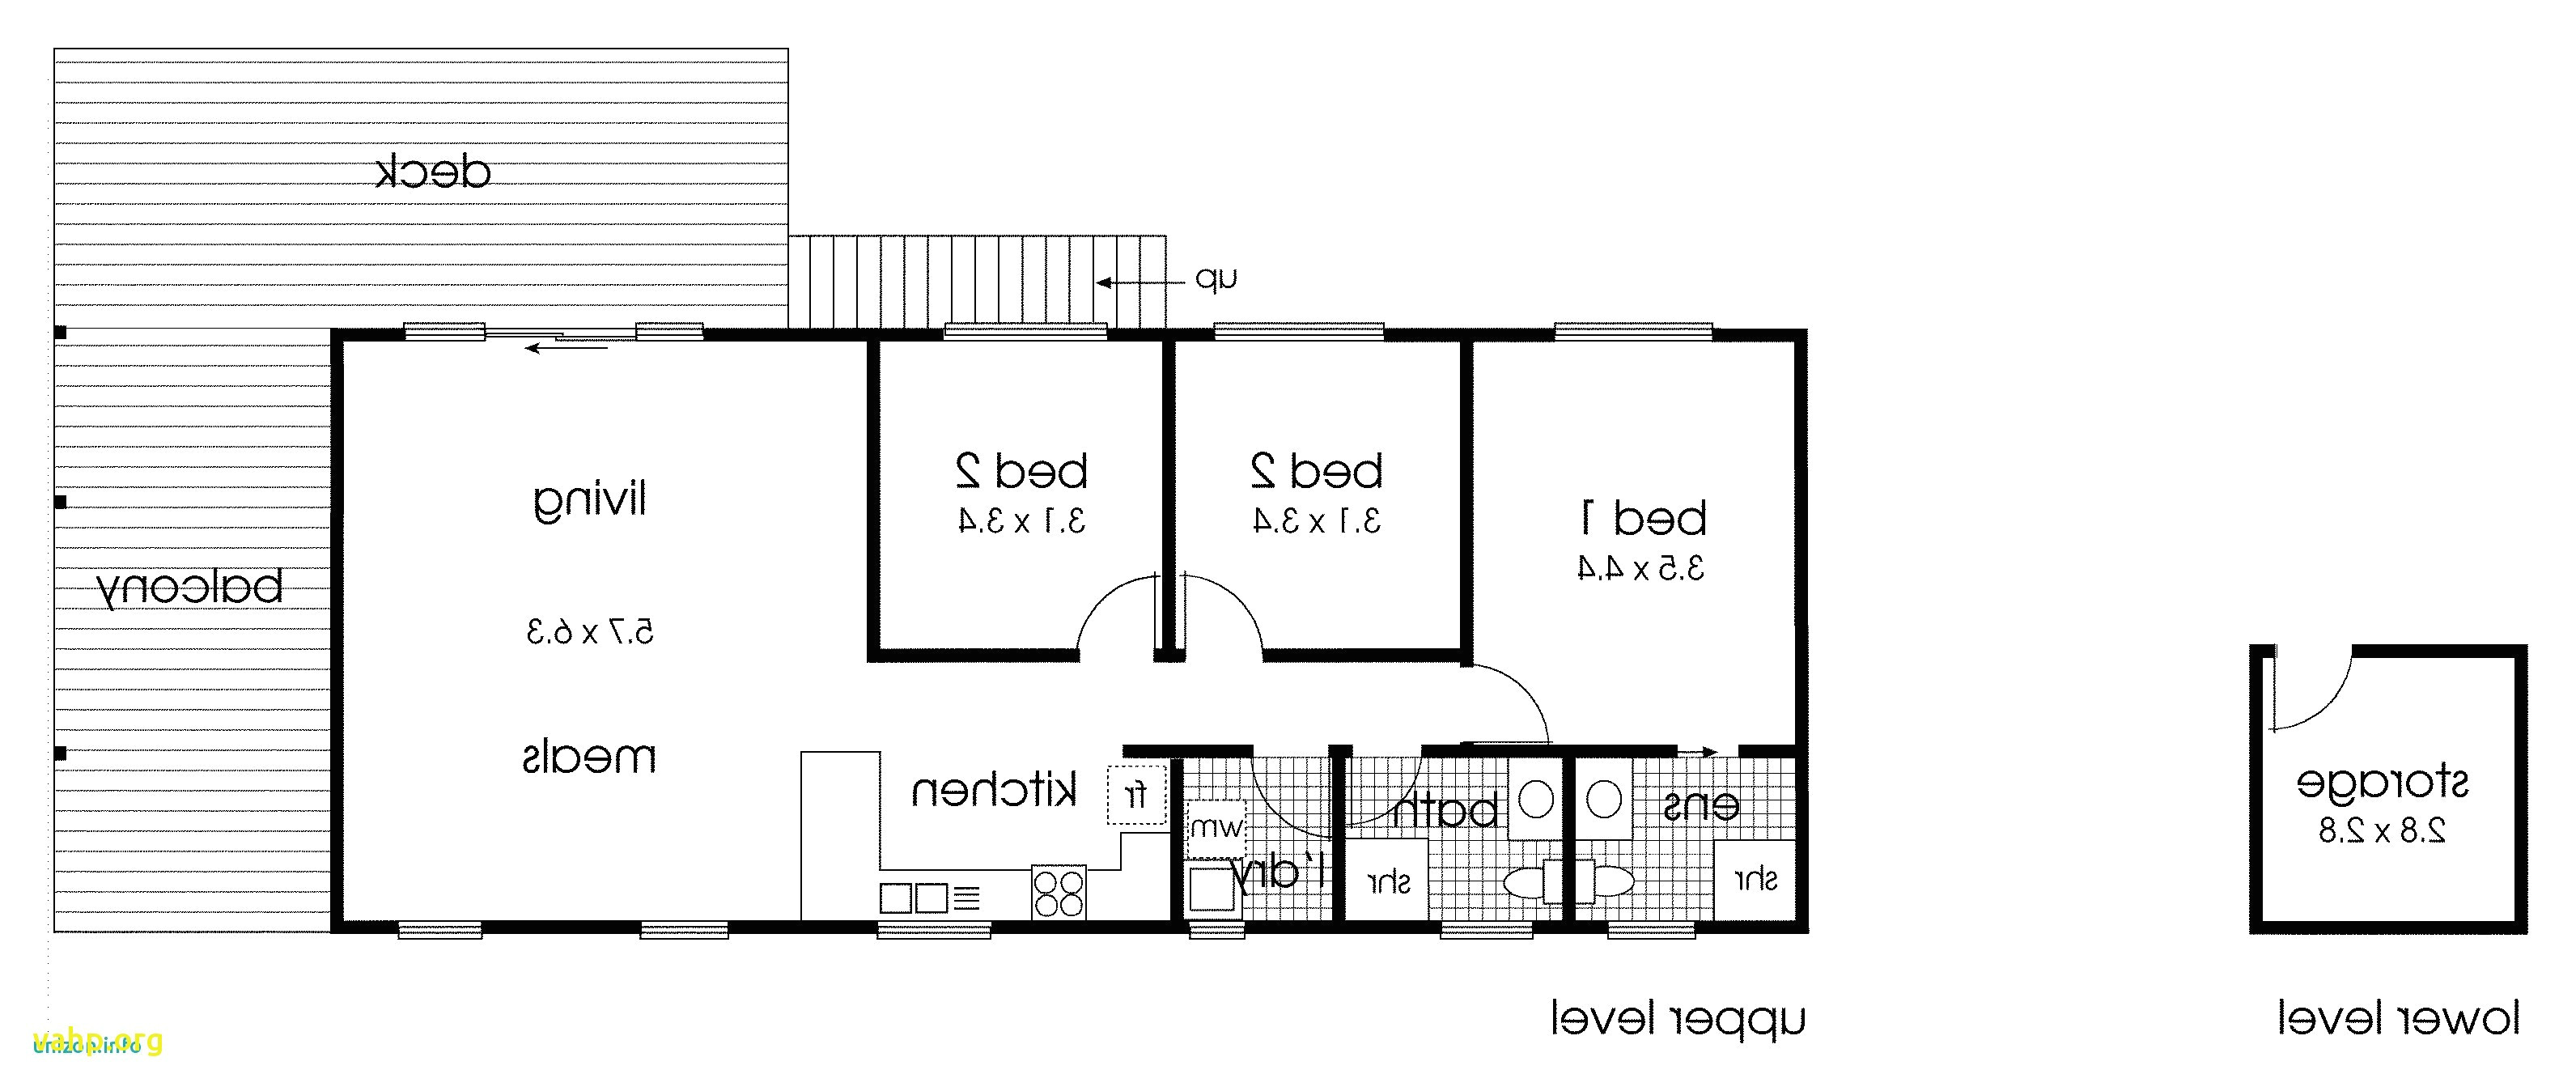 luxury dog house plans free dog house plans elegant pitbull dog house plans 0d c0df39d